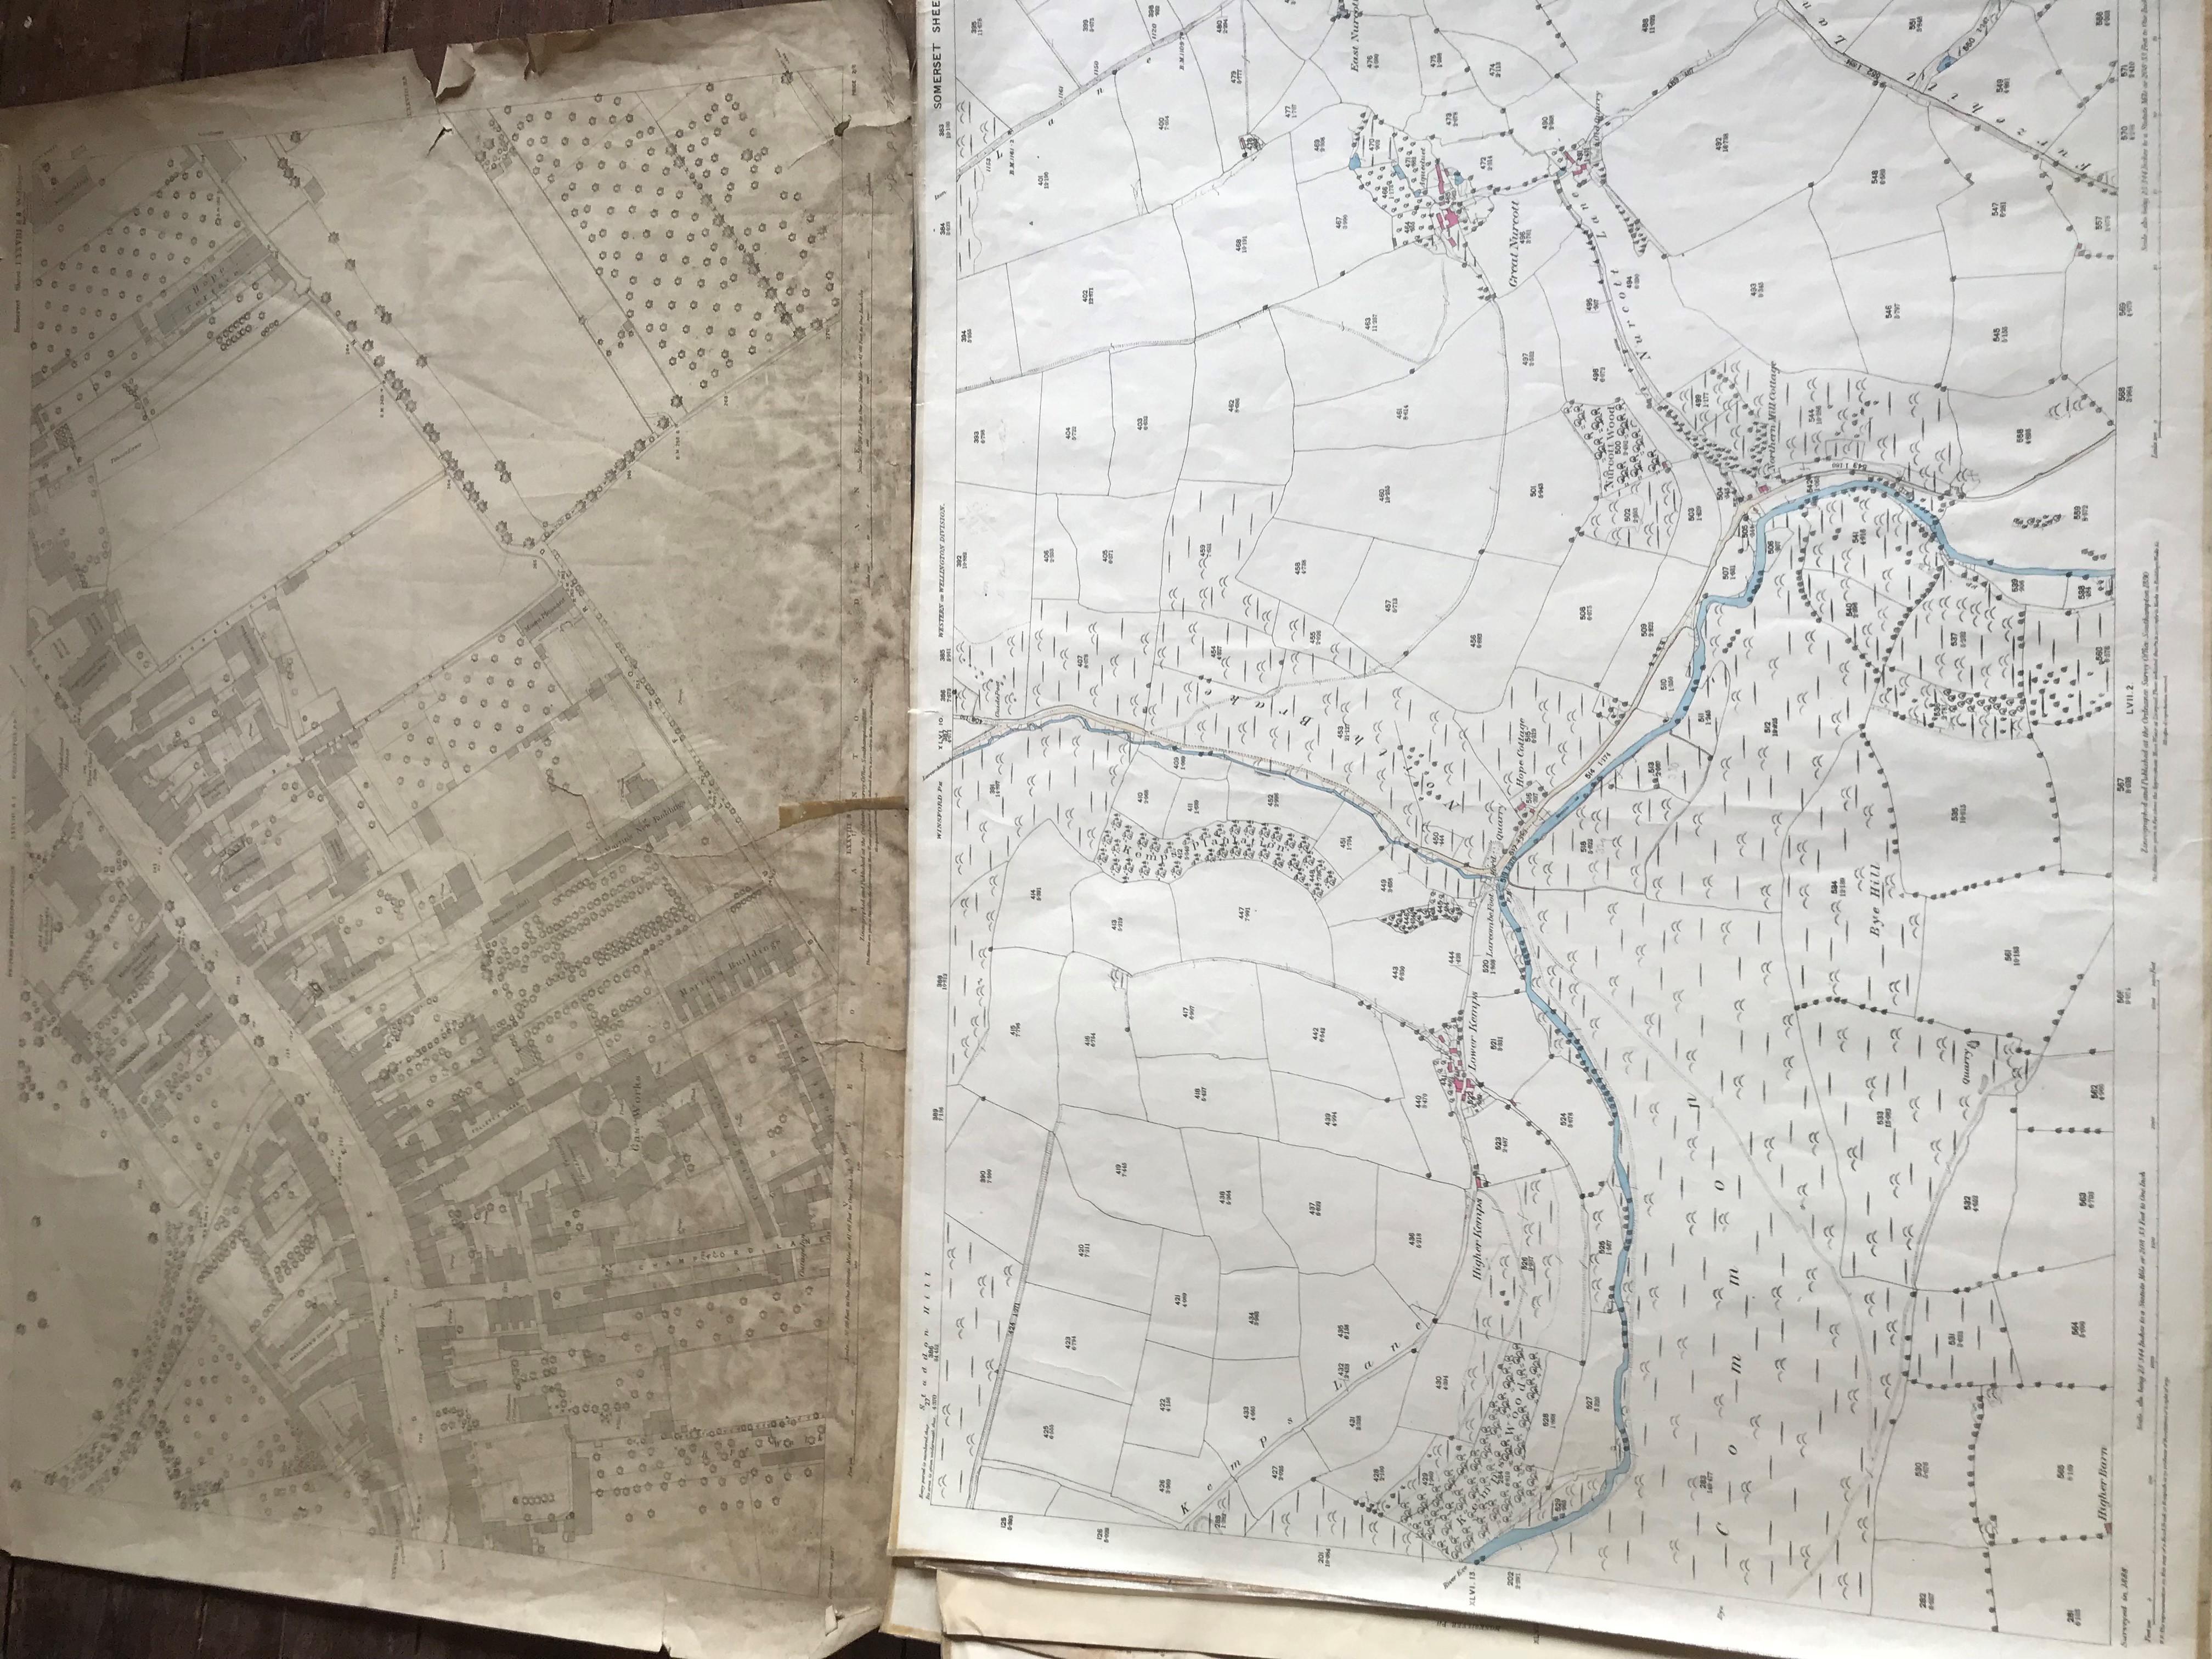 THIRTY 1:2500 ORDNANCE SURVEY MAPS featuring Chelston, Ham, Sampford Brett, Wellington, - Image 10 of 16